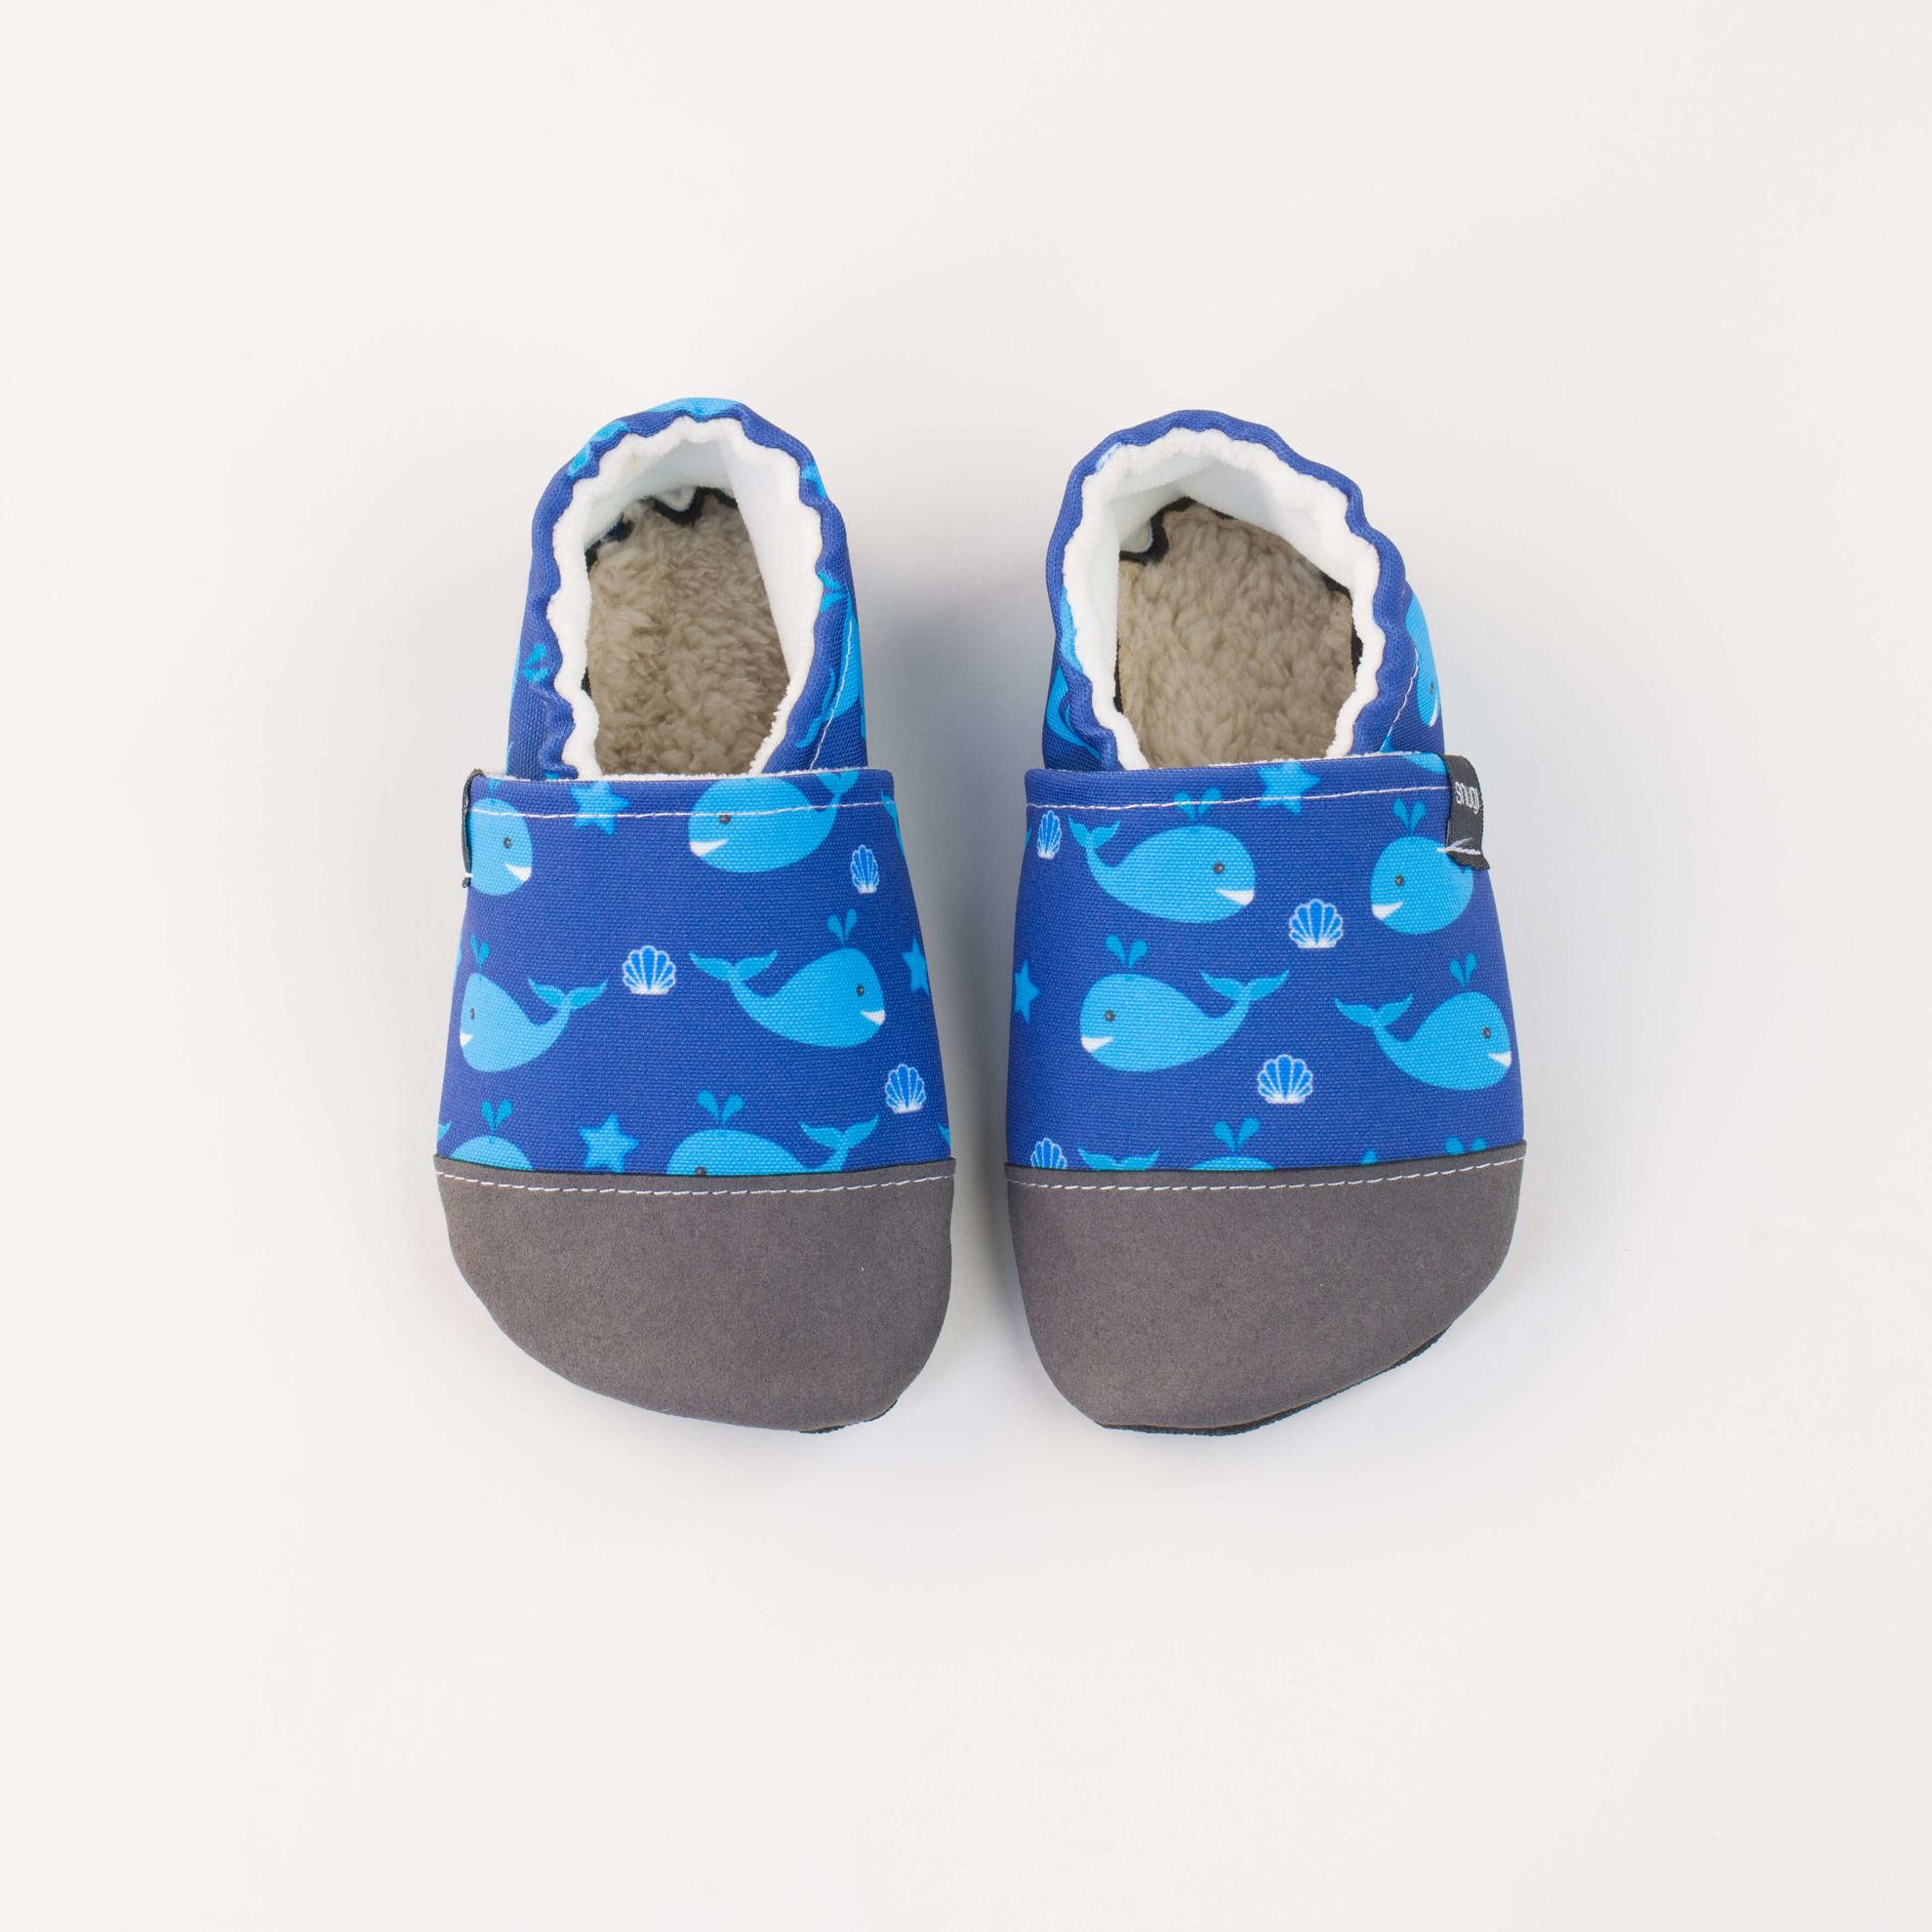 Copati - blue sea and whale